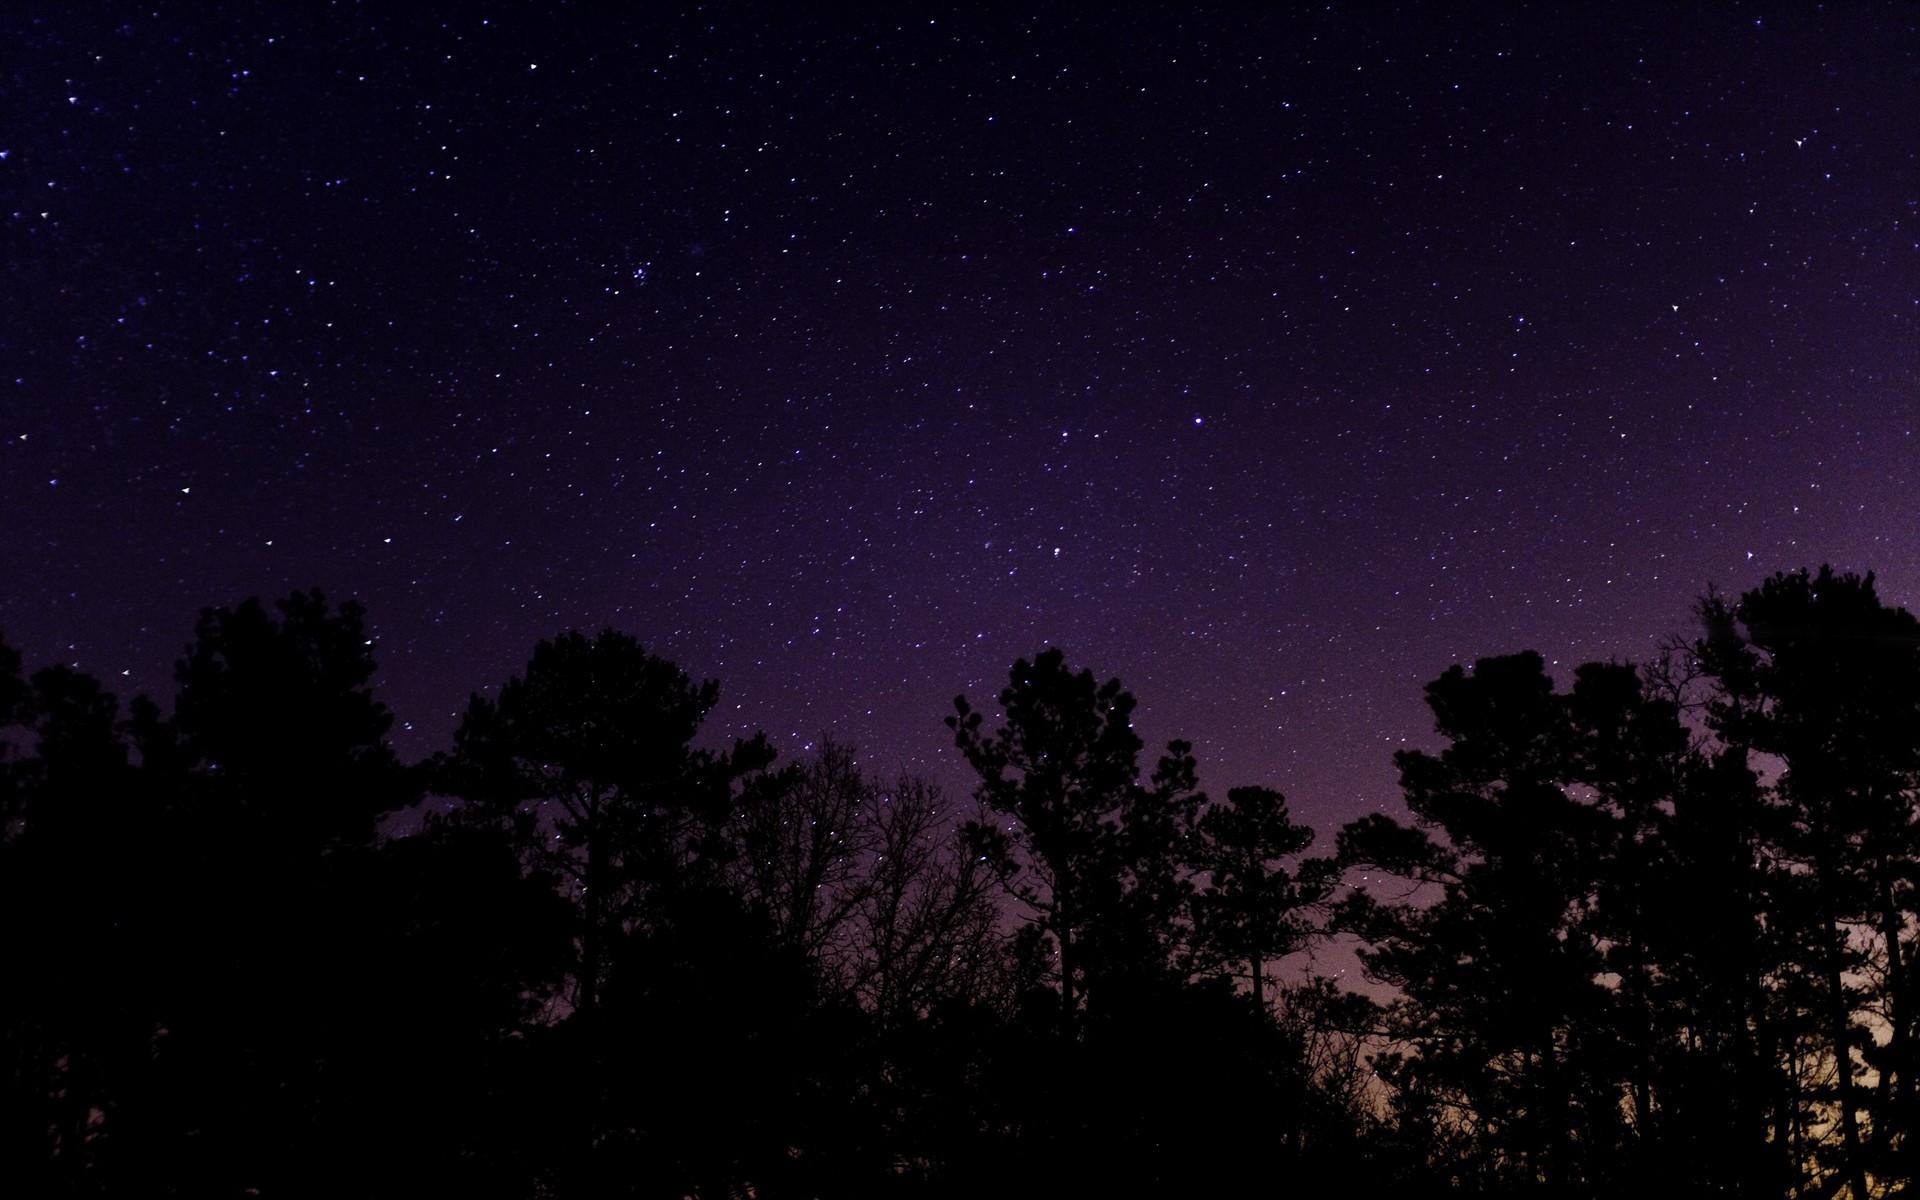 Starry Sky Wallpaper 27487